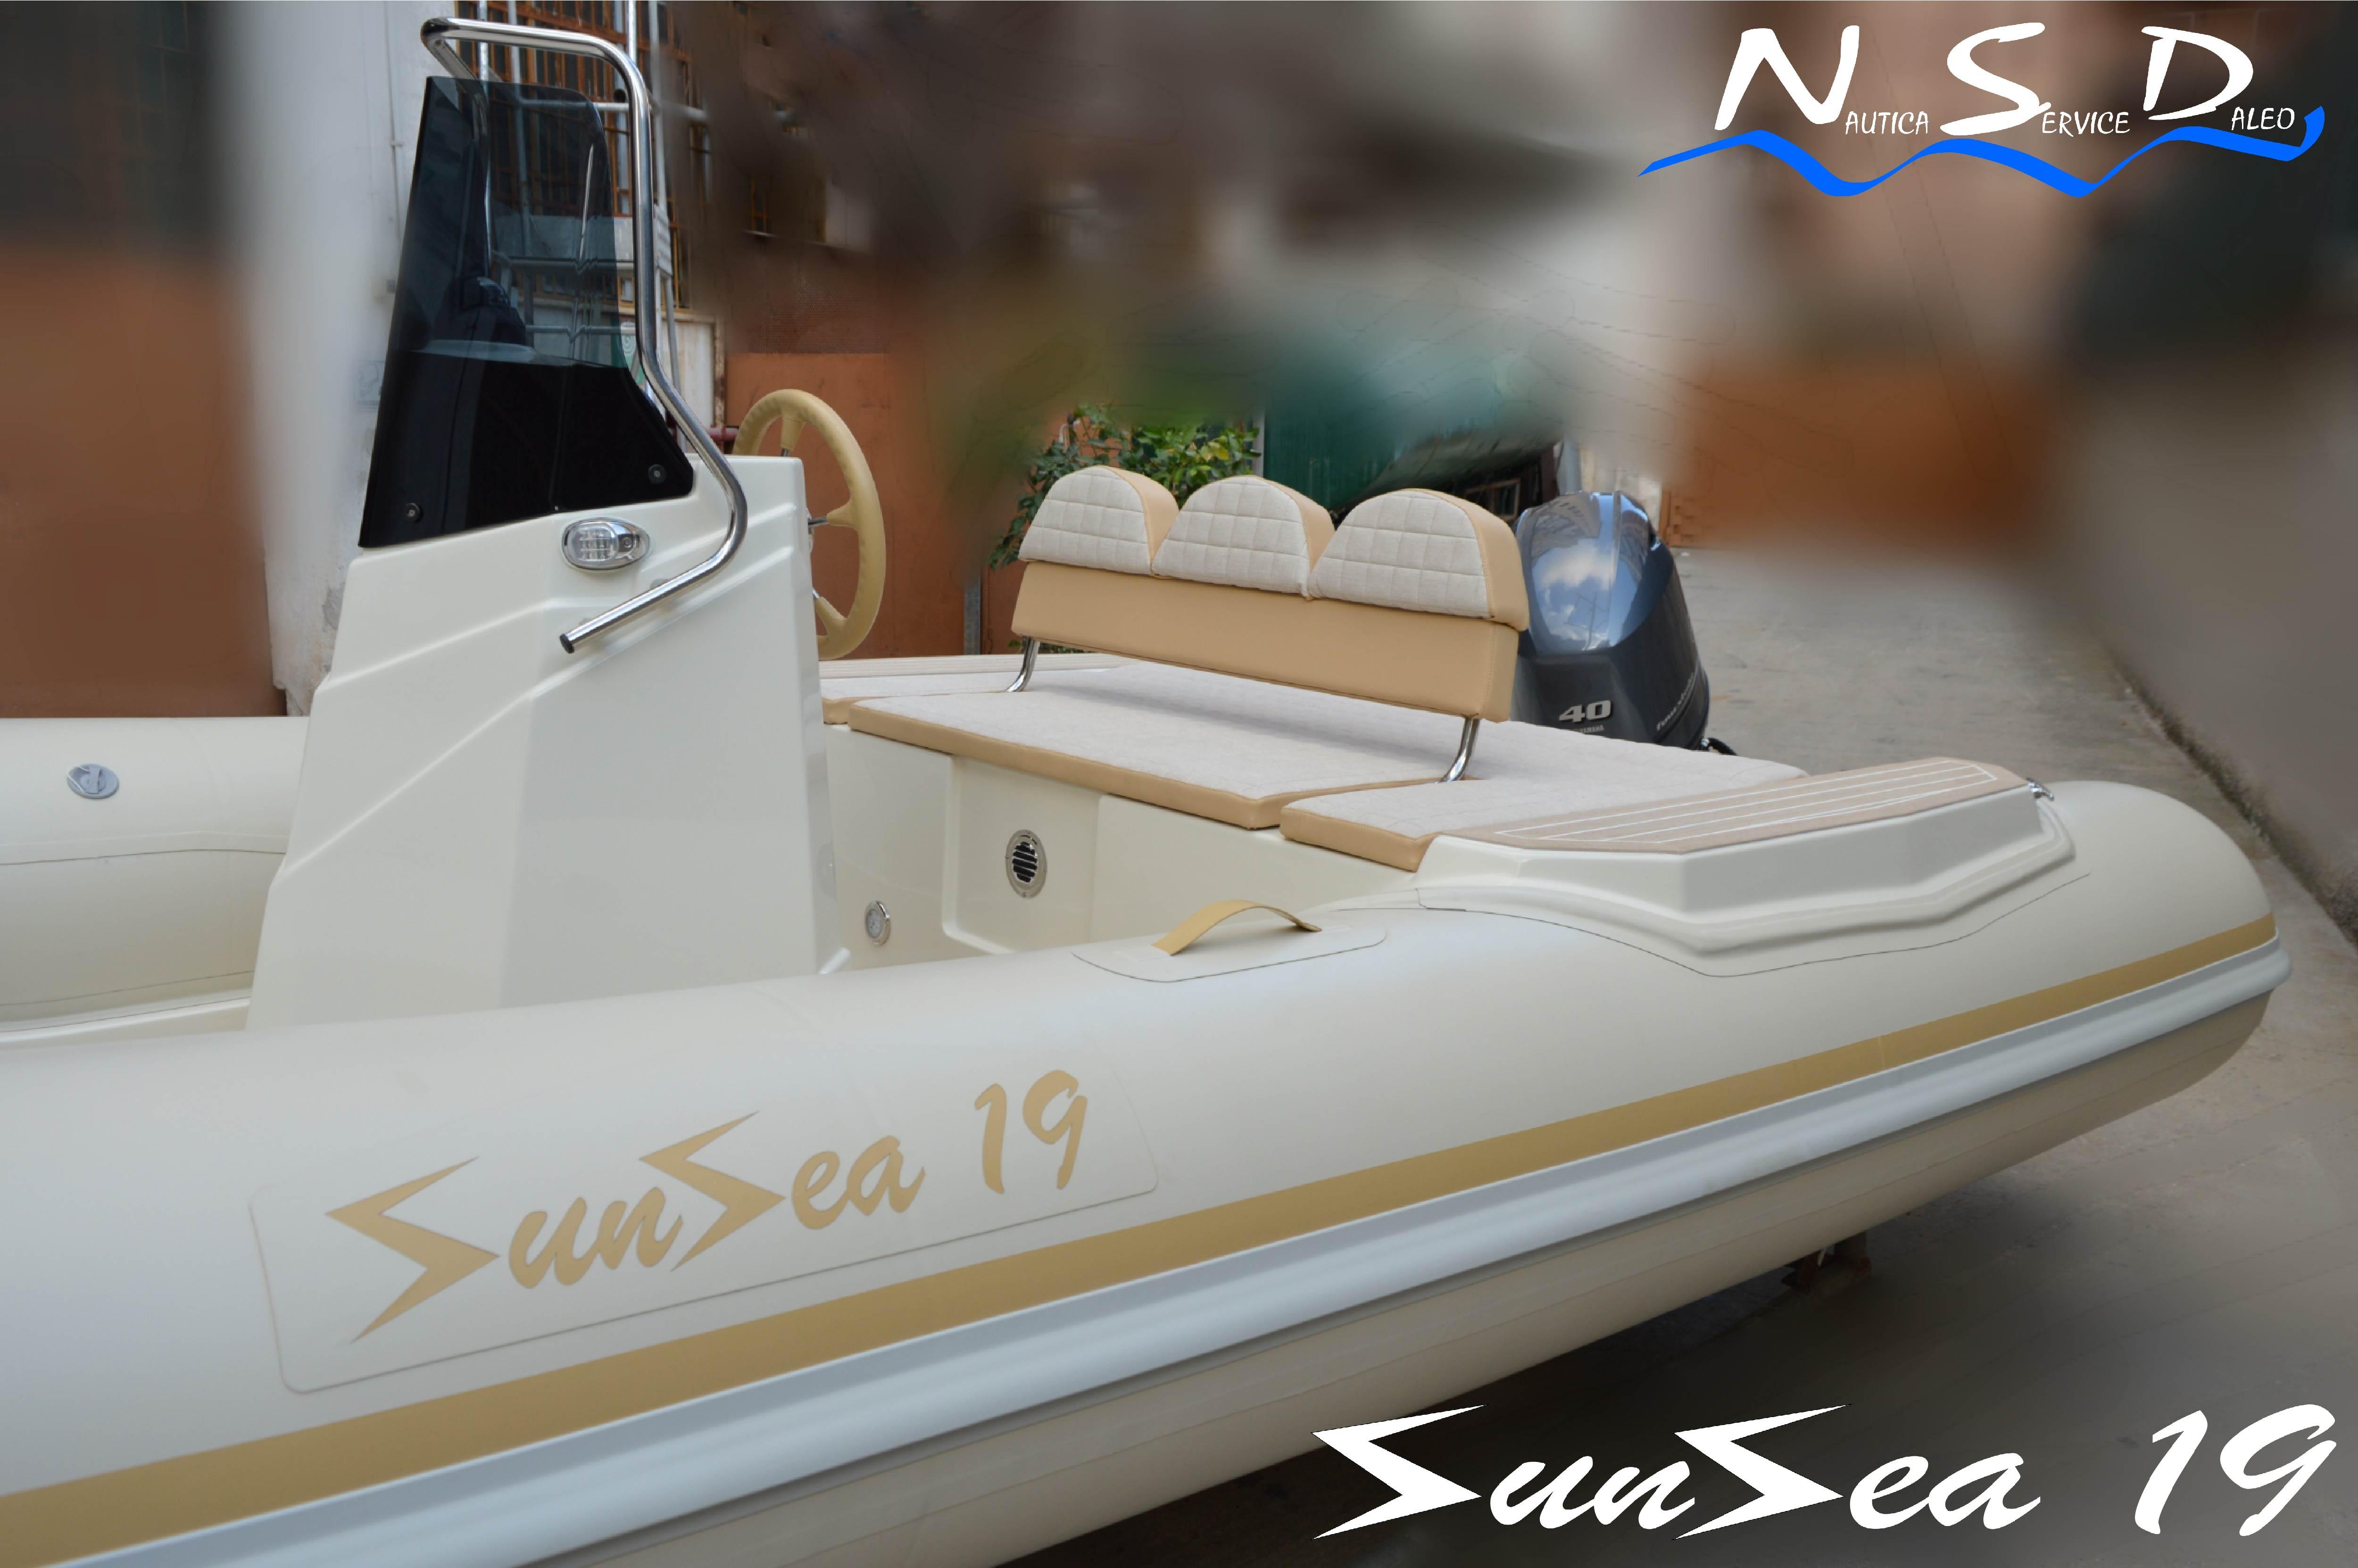 SUNSEA 19 BEIGE 2021 LOGATE (1)